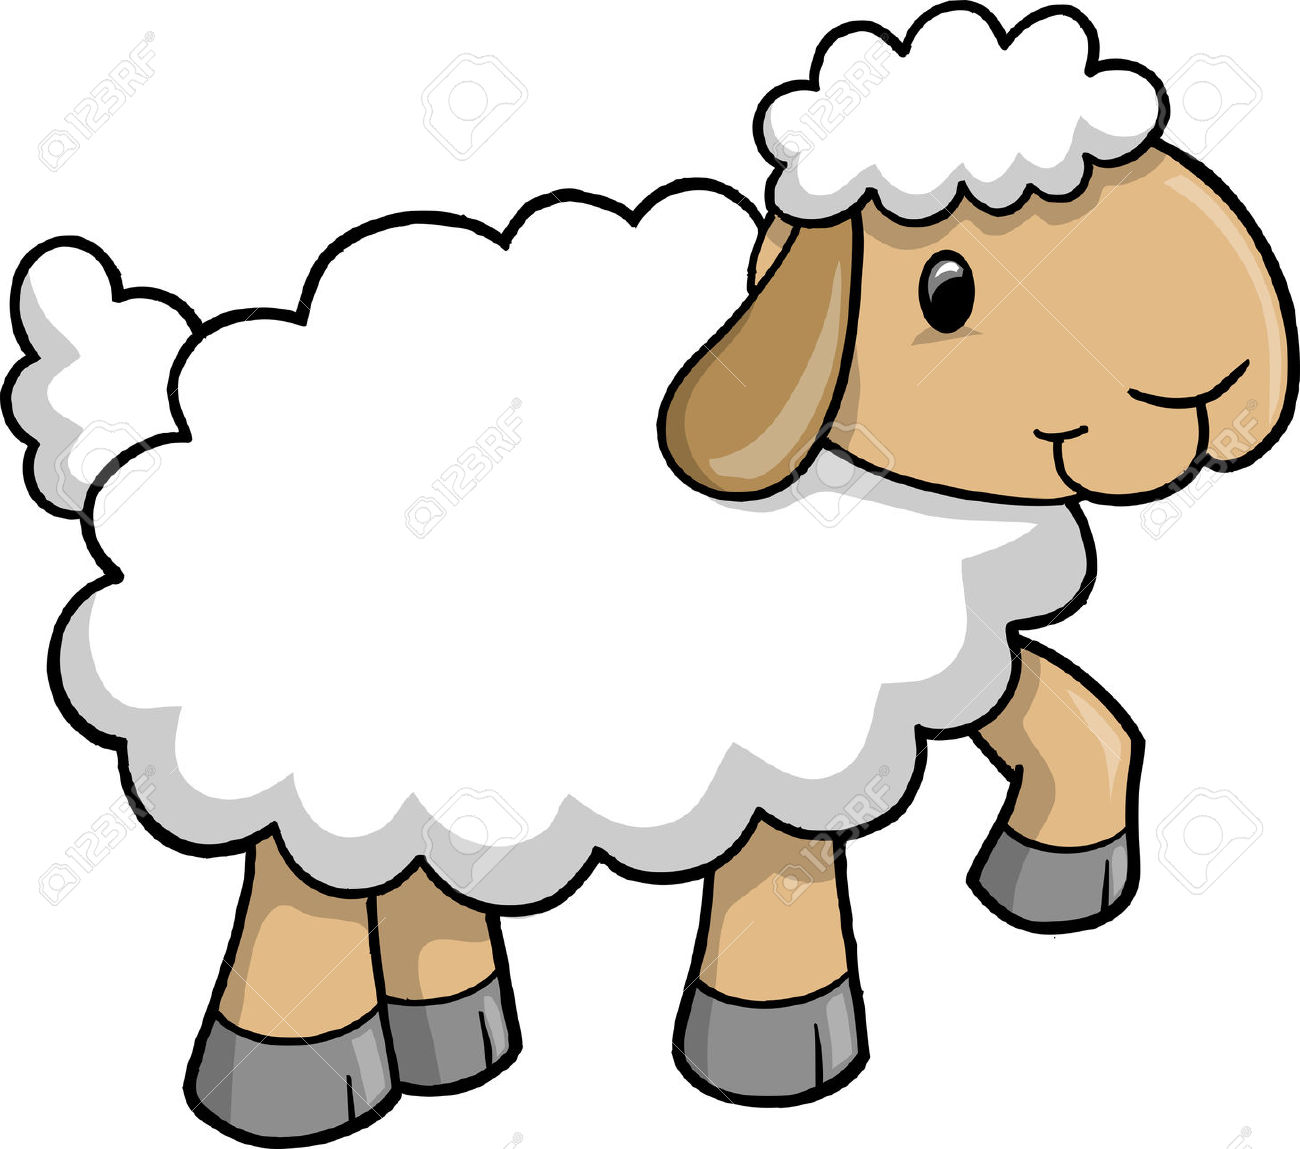 Sheep clip art. Sheep cliparts-Sheep clip art. Sheep cliparts-1